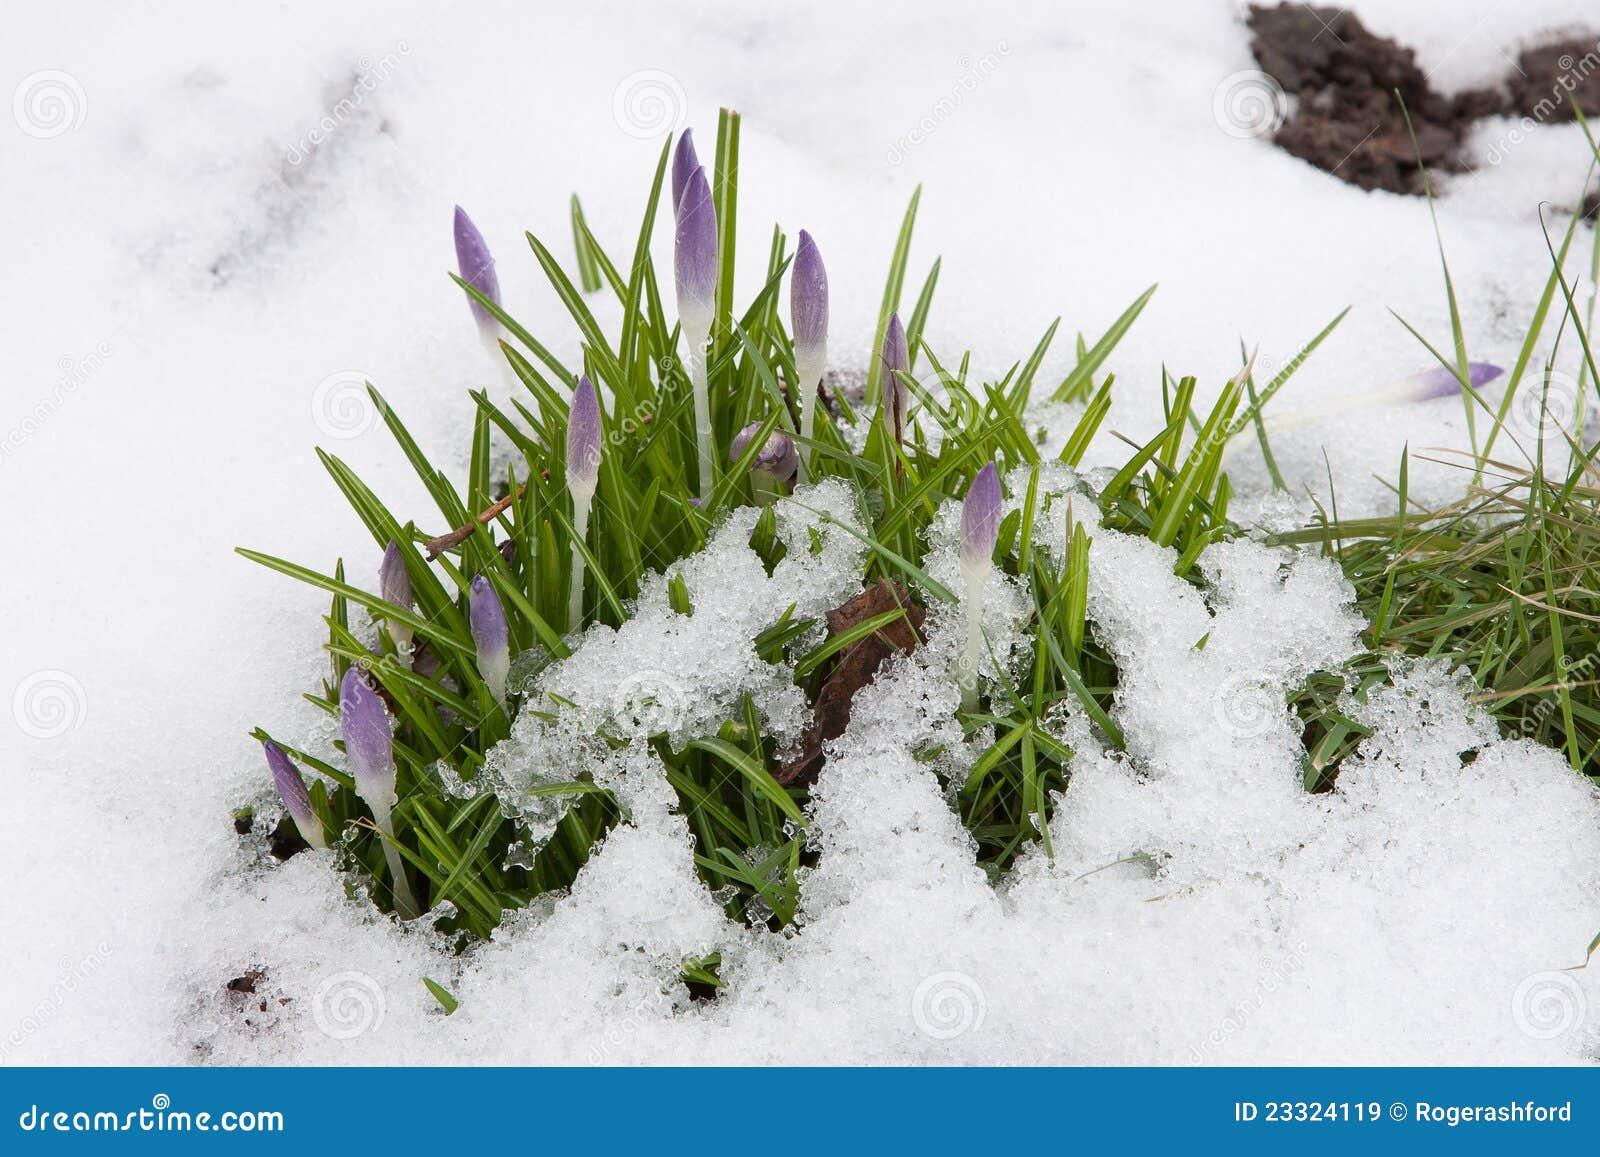 Crocus Buds in Snow